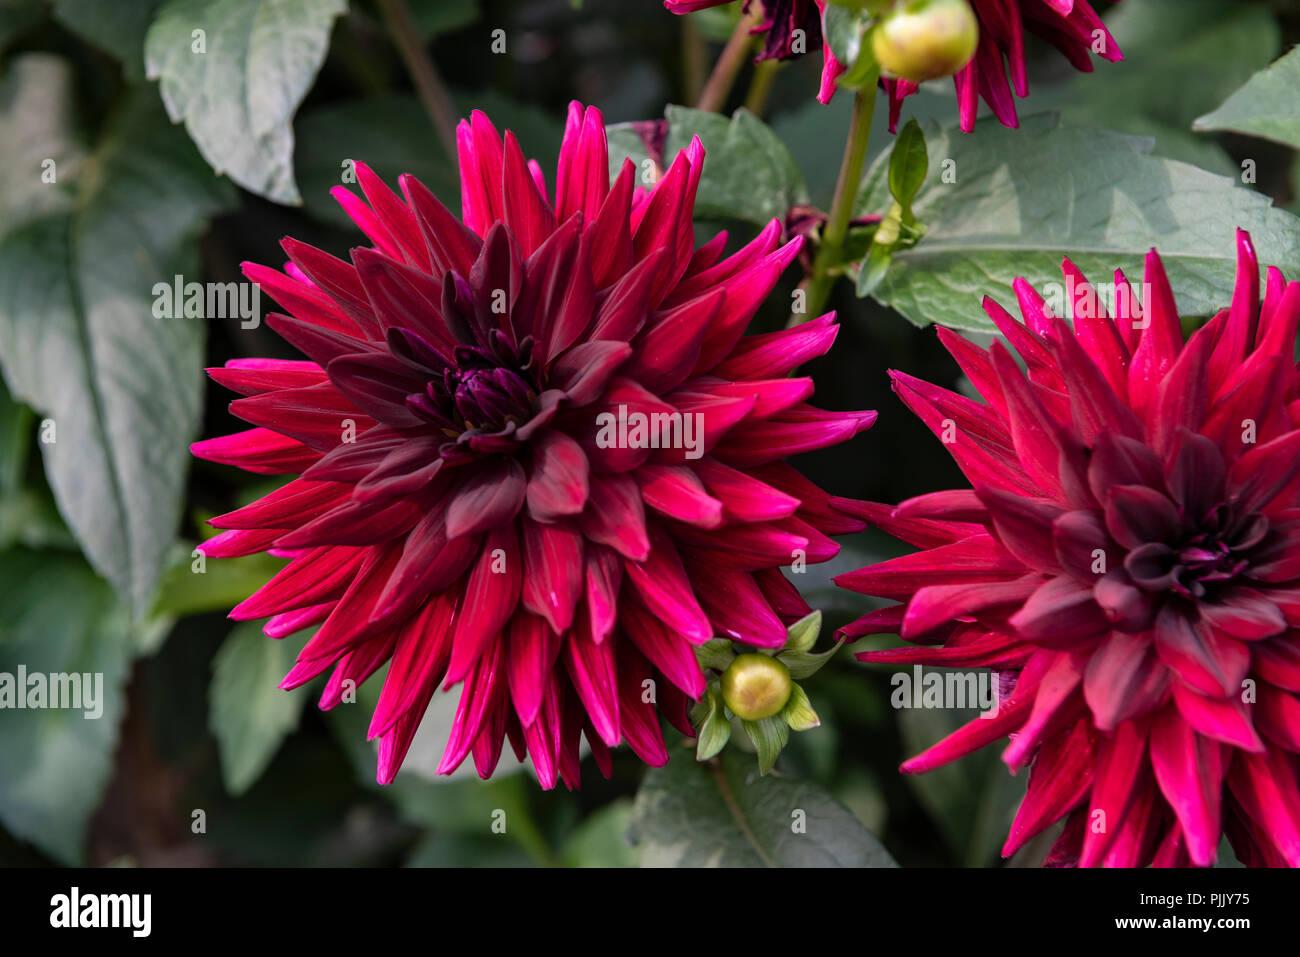 Crimson dahlia flower stock photos crimson dahlia flower stock dahlia kennedy semi cactus burgundy magenta flower stock image izmirmasajfo